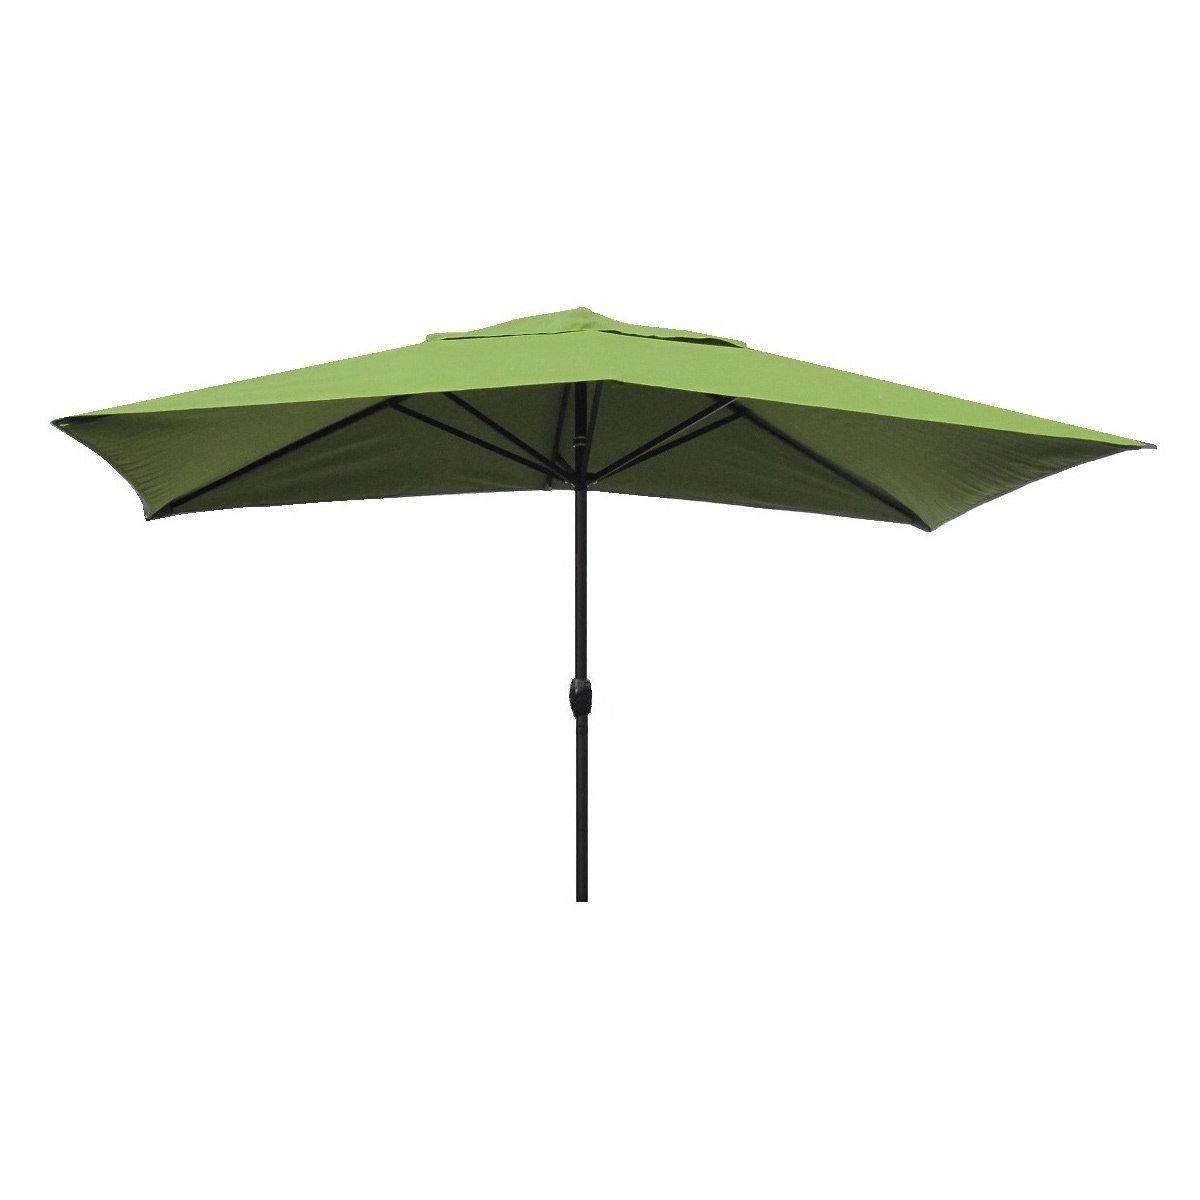 Most Recent Wieczorek Auto Tilt Rectangular Market Sunbrella Umbrellas For Gries 10' X 6' Rectangular Market Umbrella (View 13 of 20)